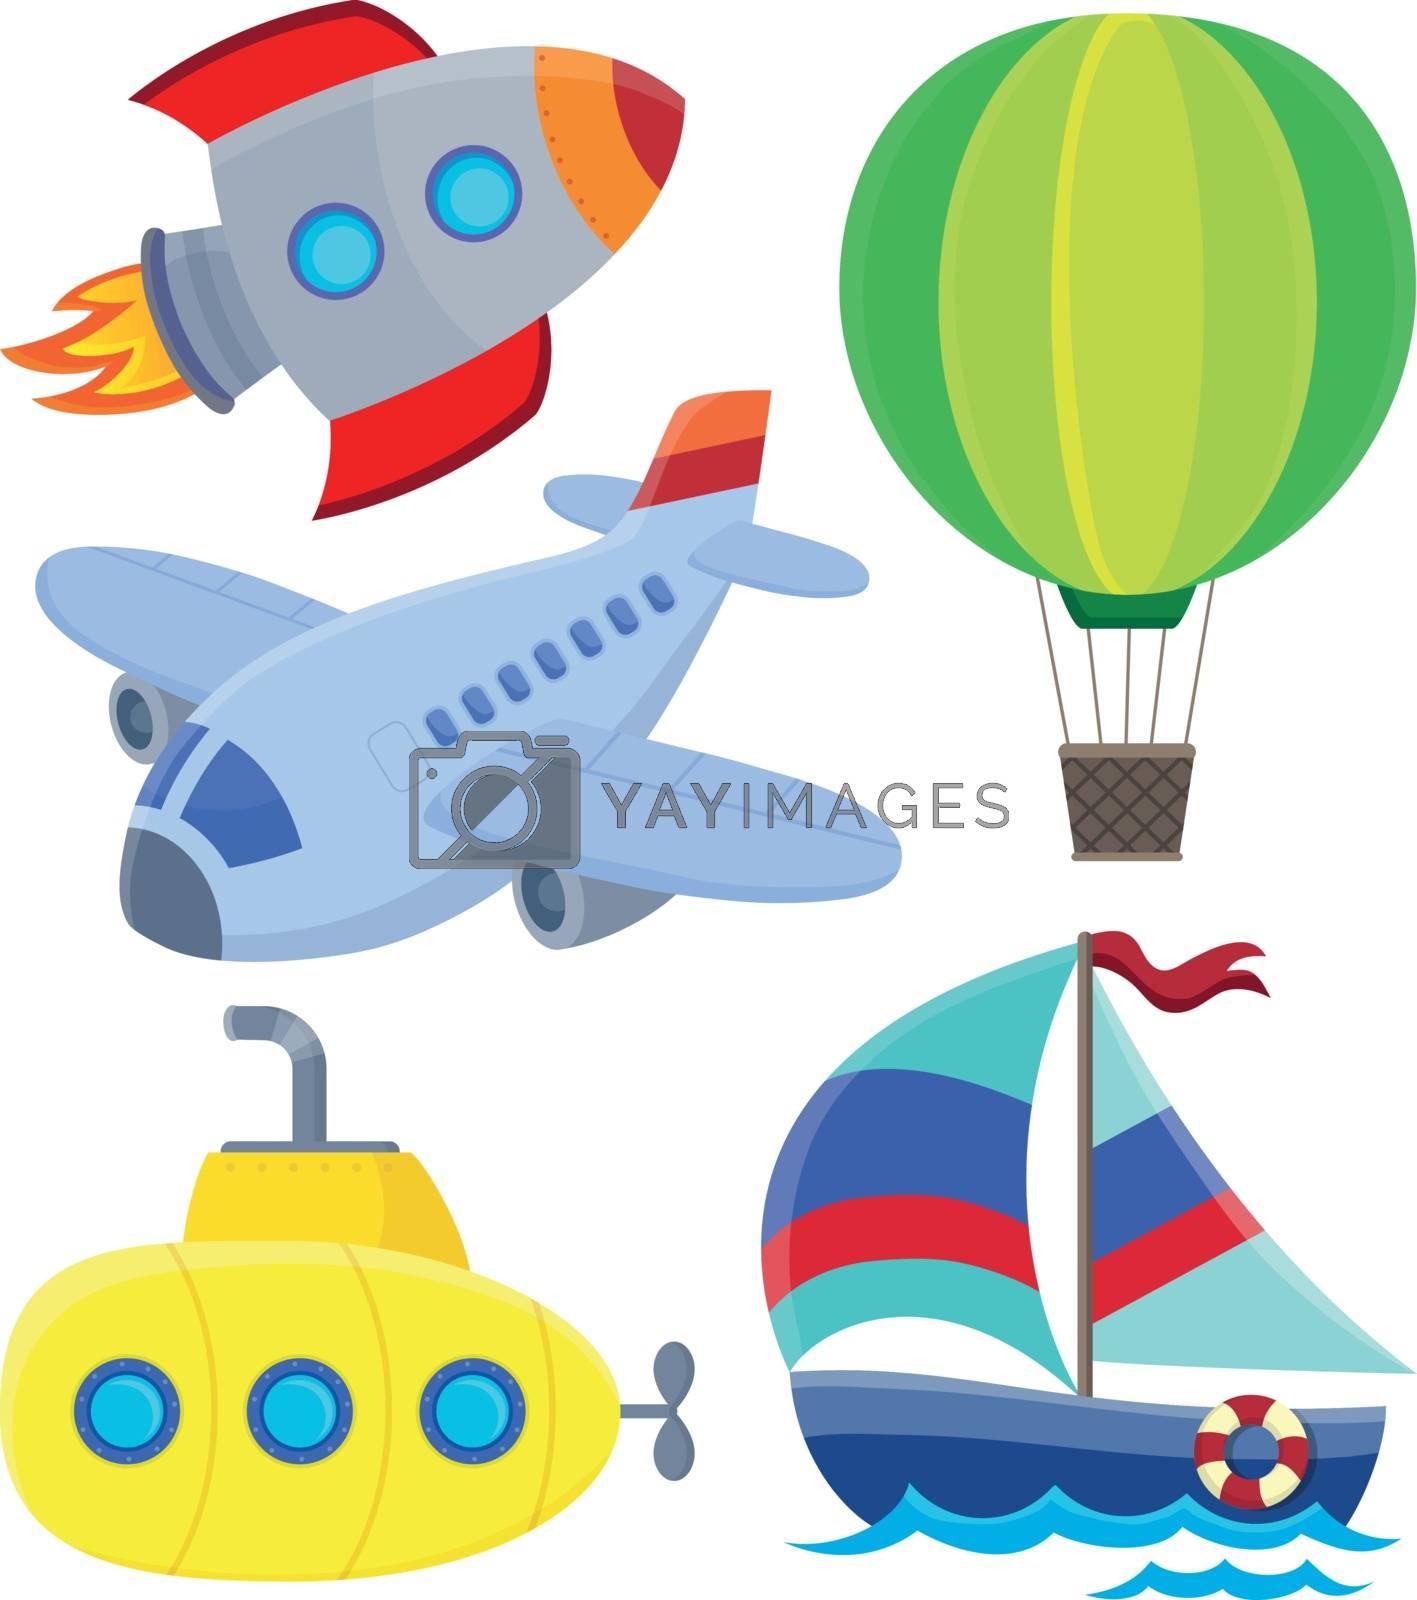 Transportation theme collection 1 - eps10 vector illustration.